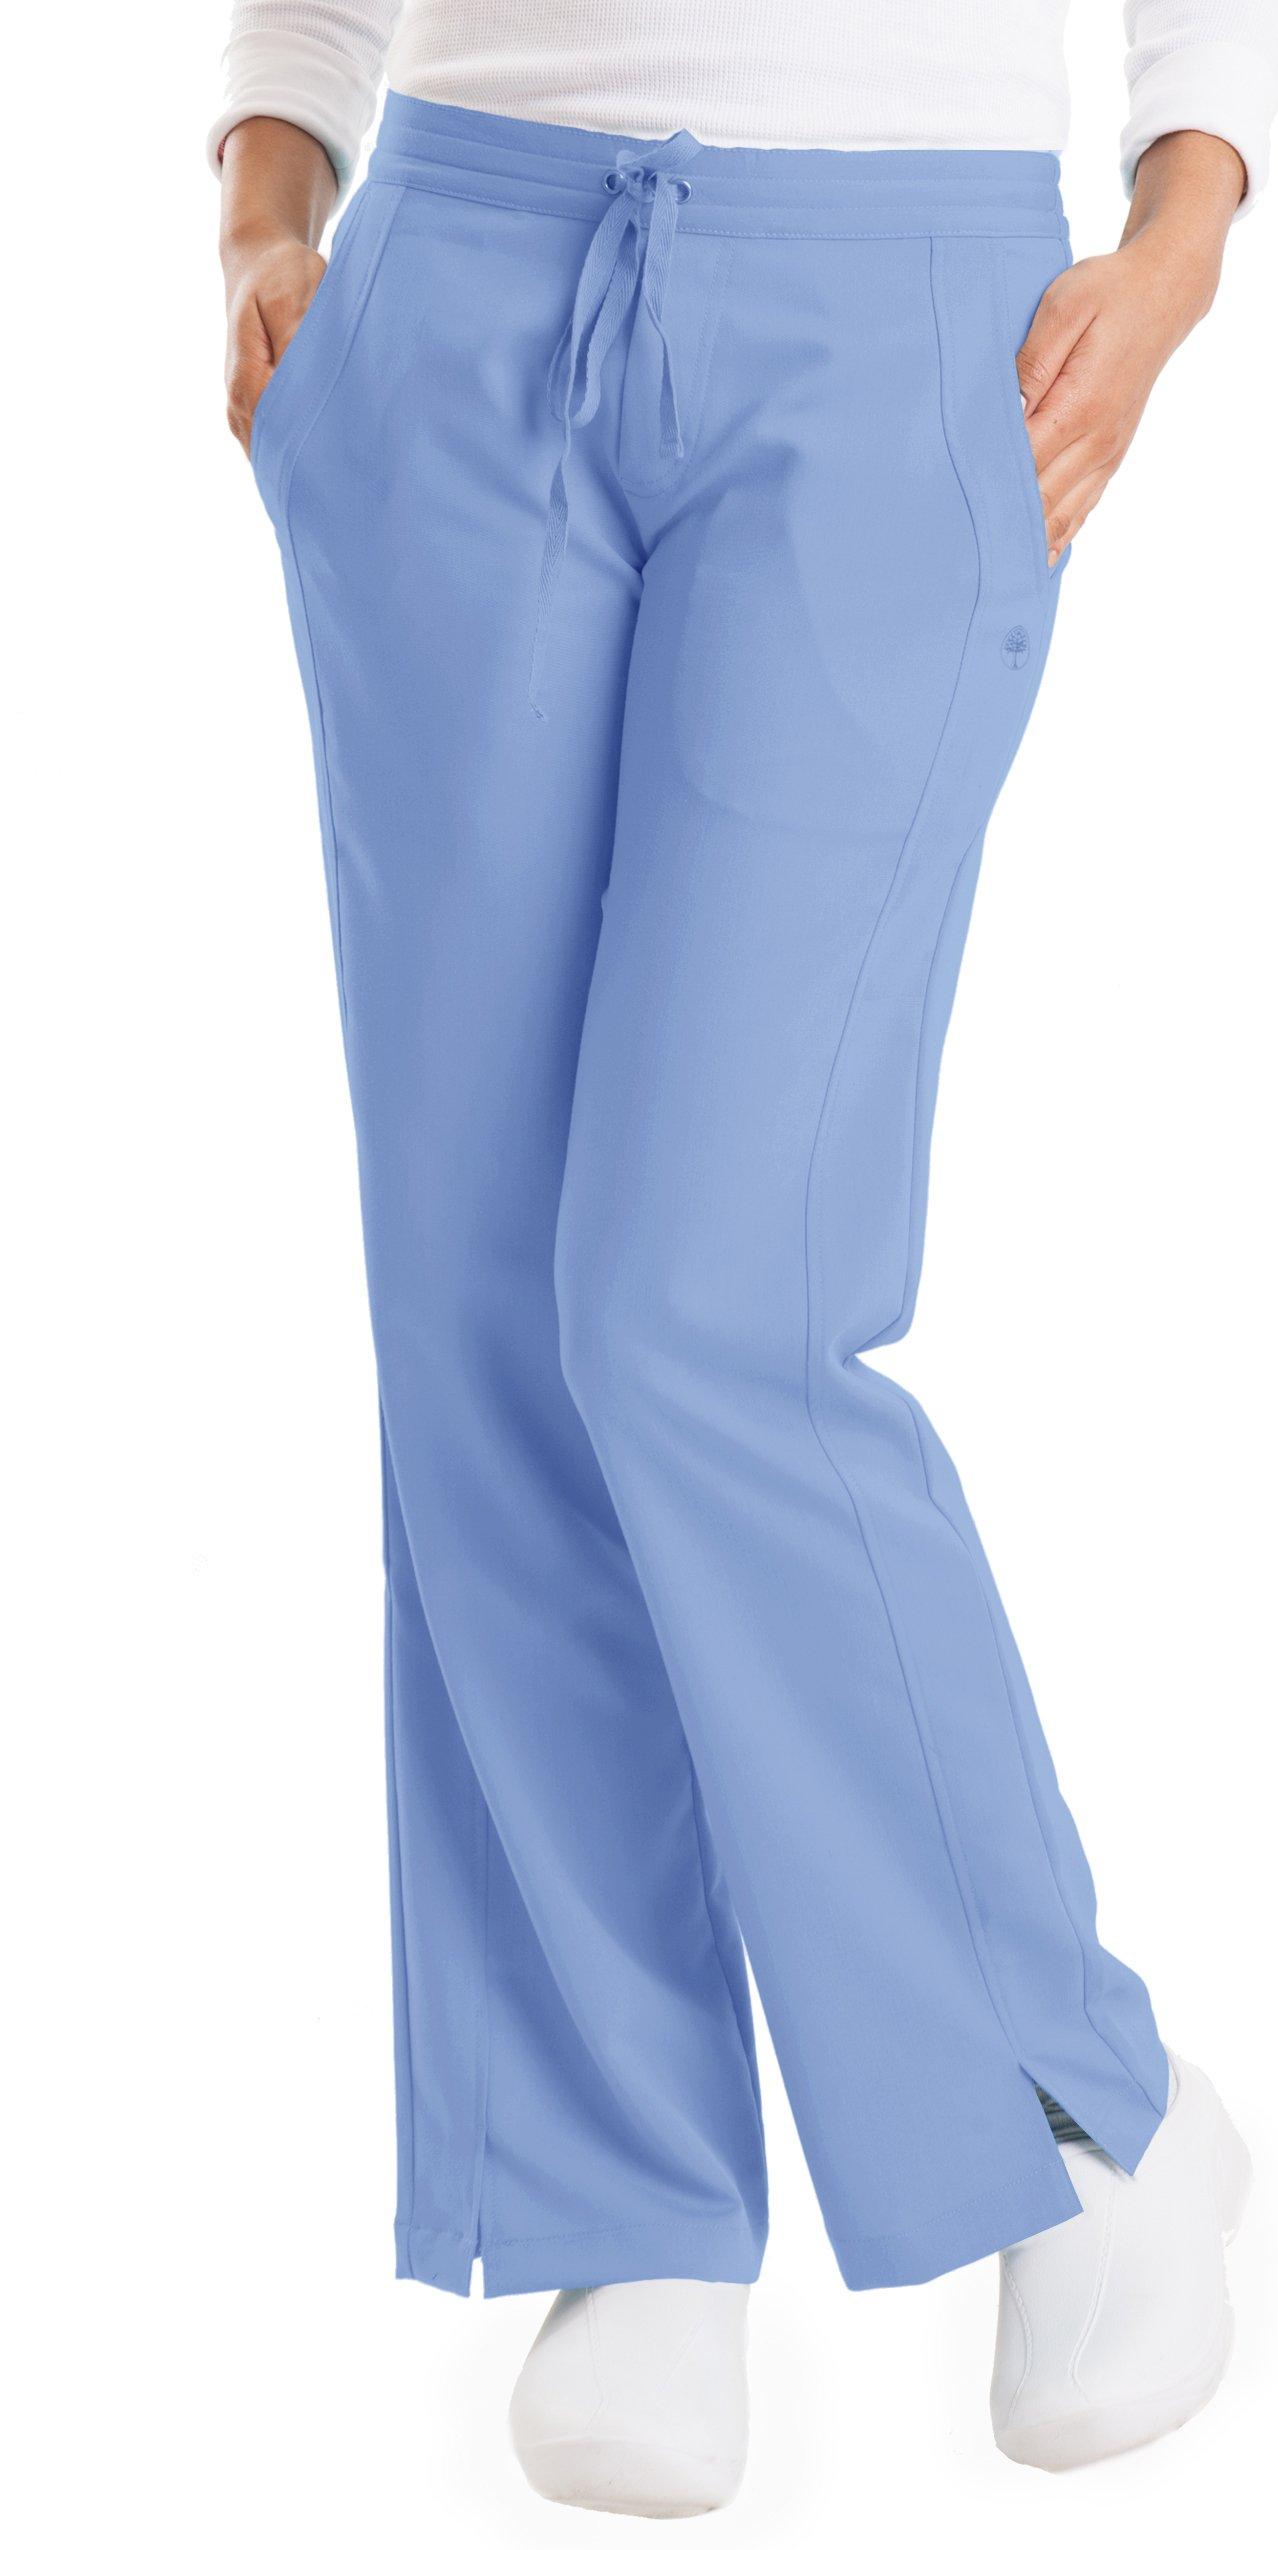 Healing Hands Purple Label Women's Taylor 9095 2 Pocket Drawstring Scrub Pant Scrubs- Ceil Blue- LT